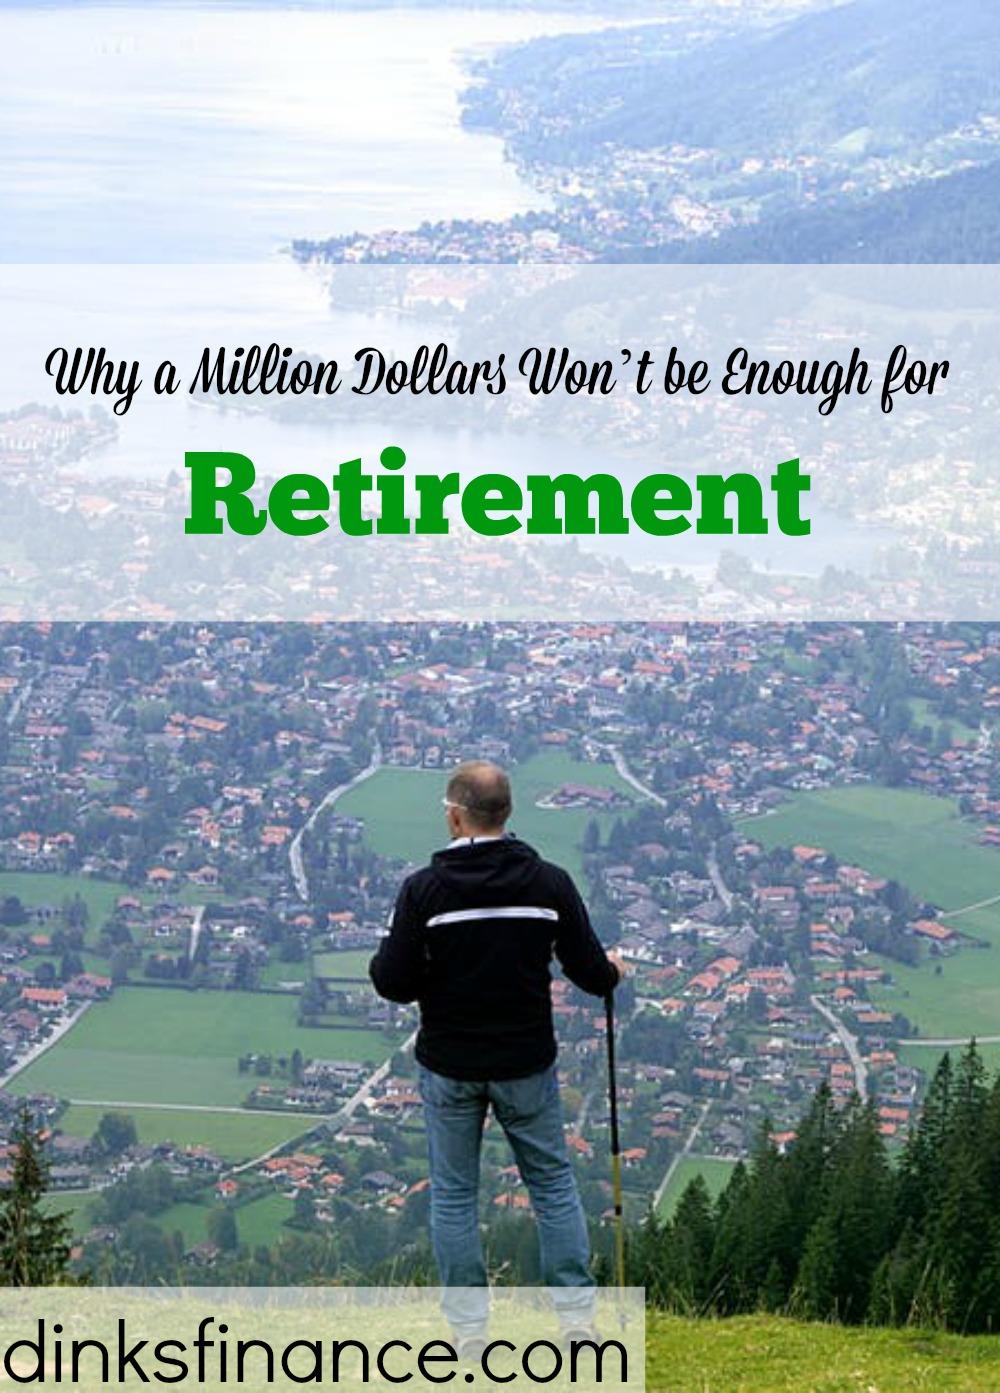 retirement tips, retirement advice, retirement plans